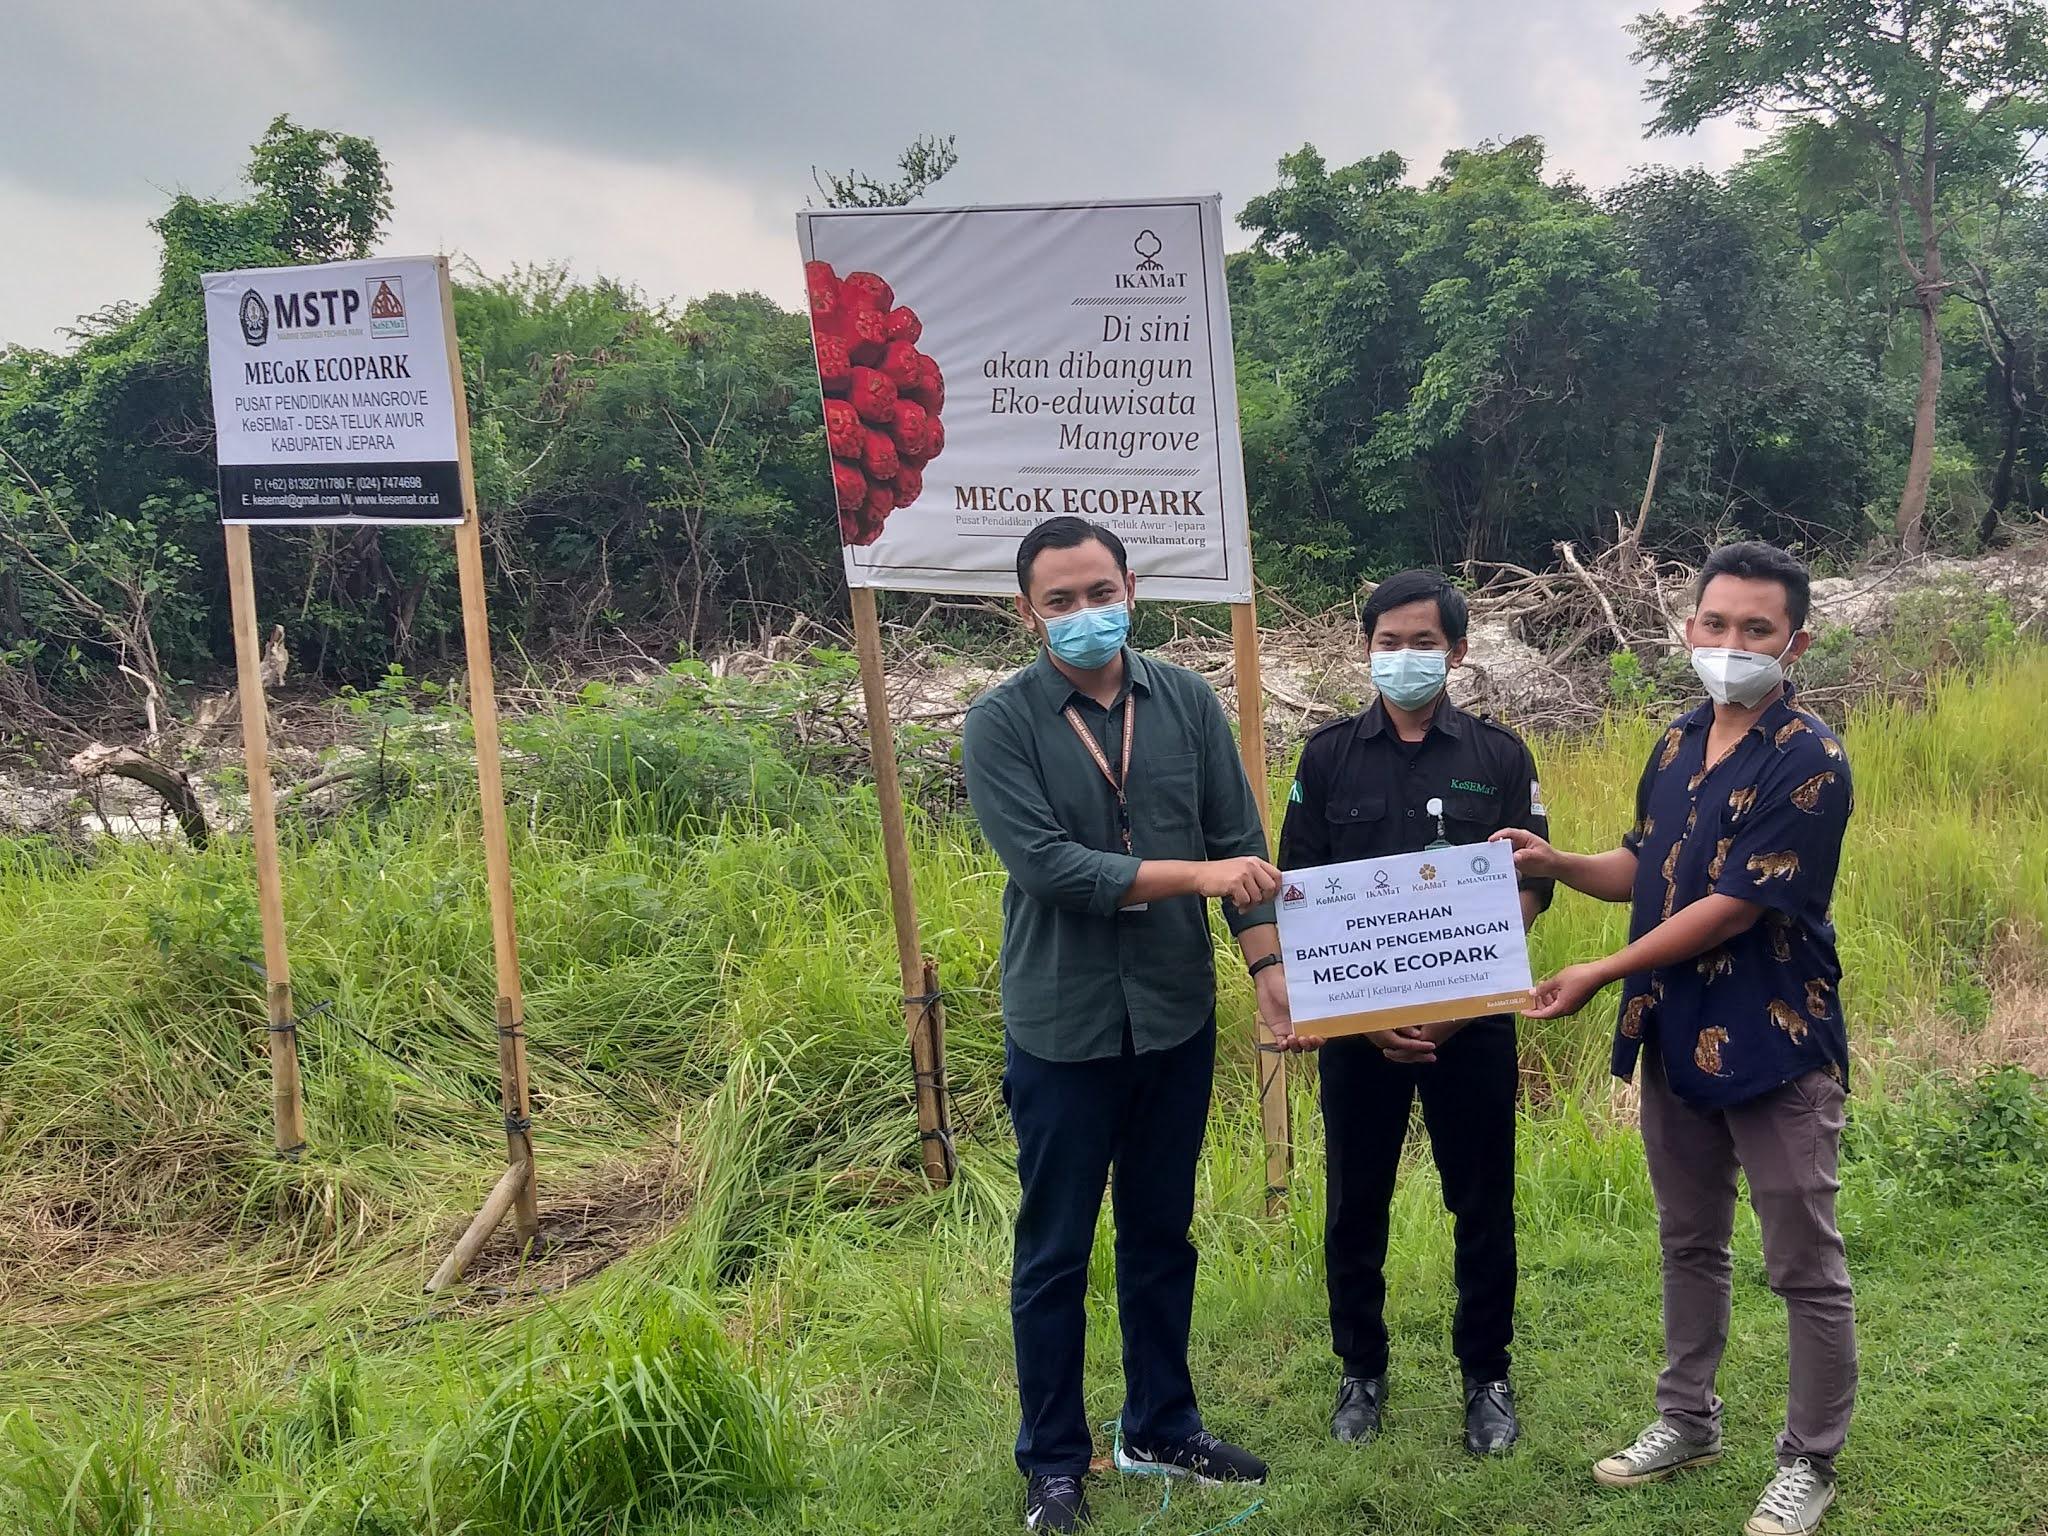 KeAMaT Serahkan Bantuan Pengembangan MECoK Ecopark